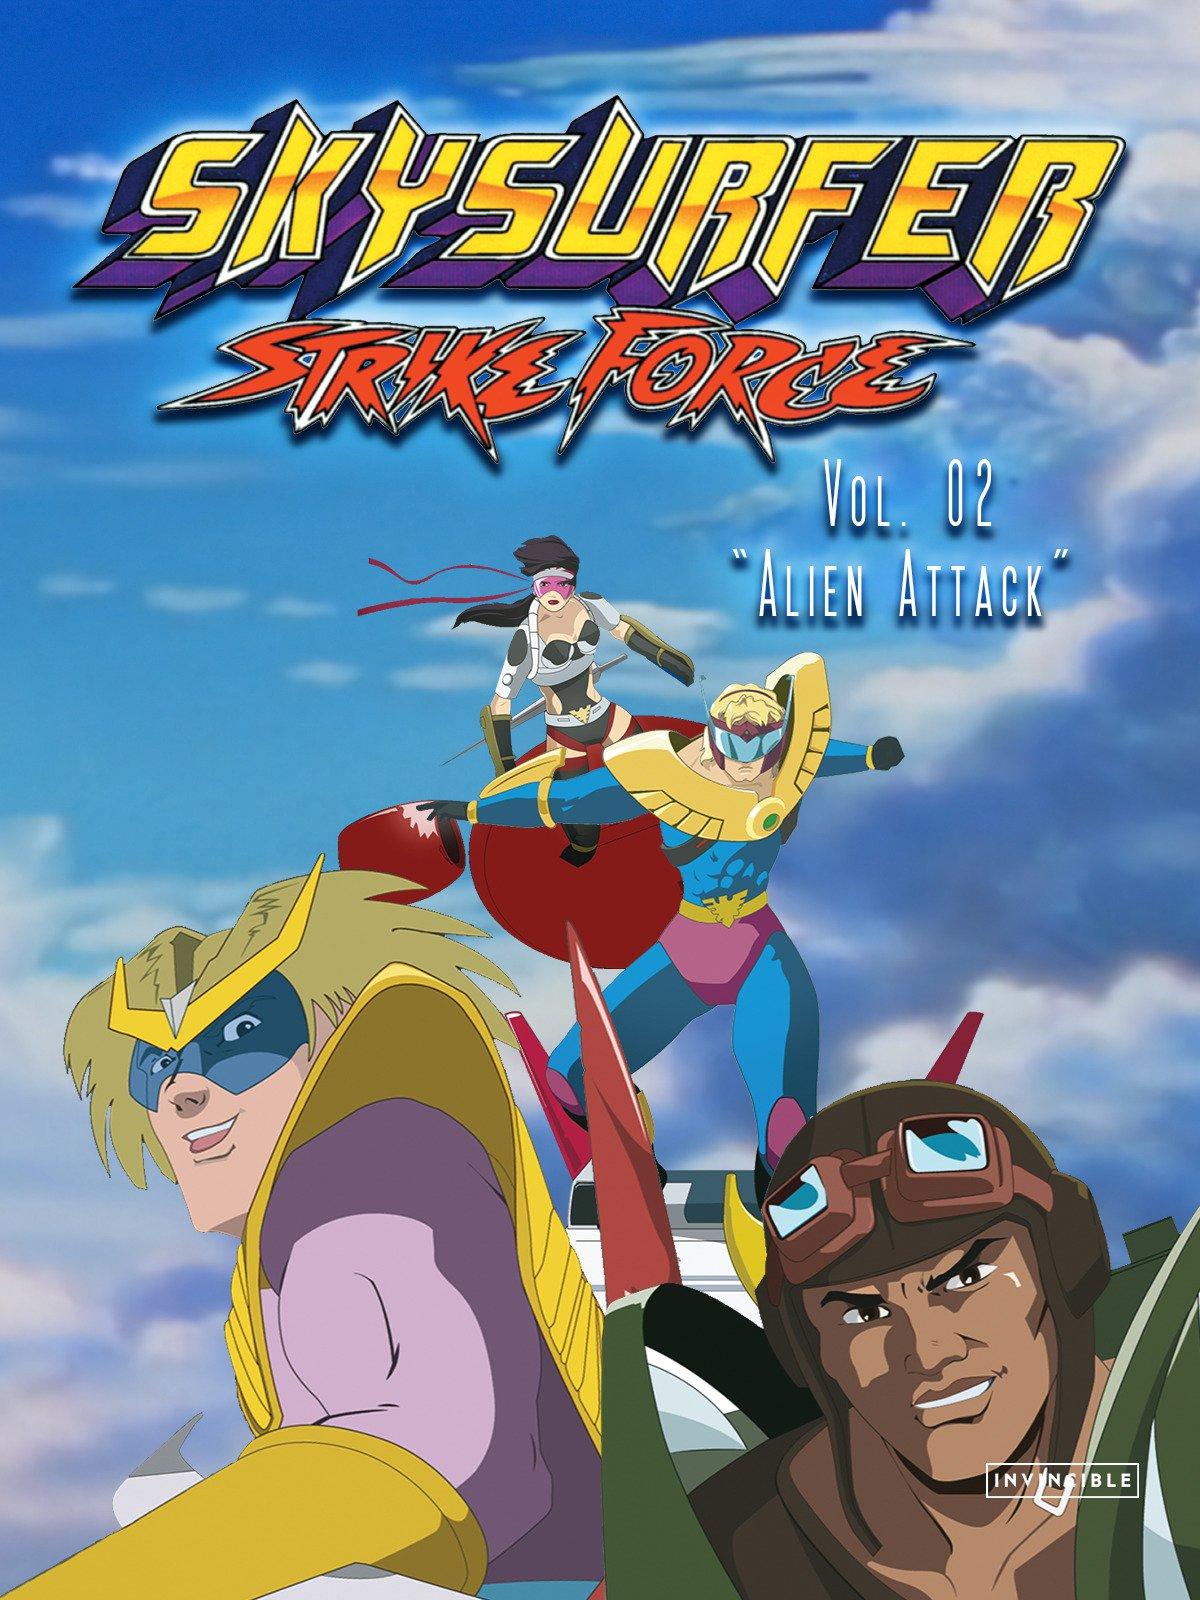 Skysurfer Strike Force Vol. 02Alien Attack